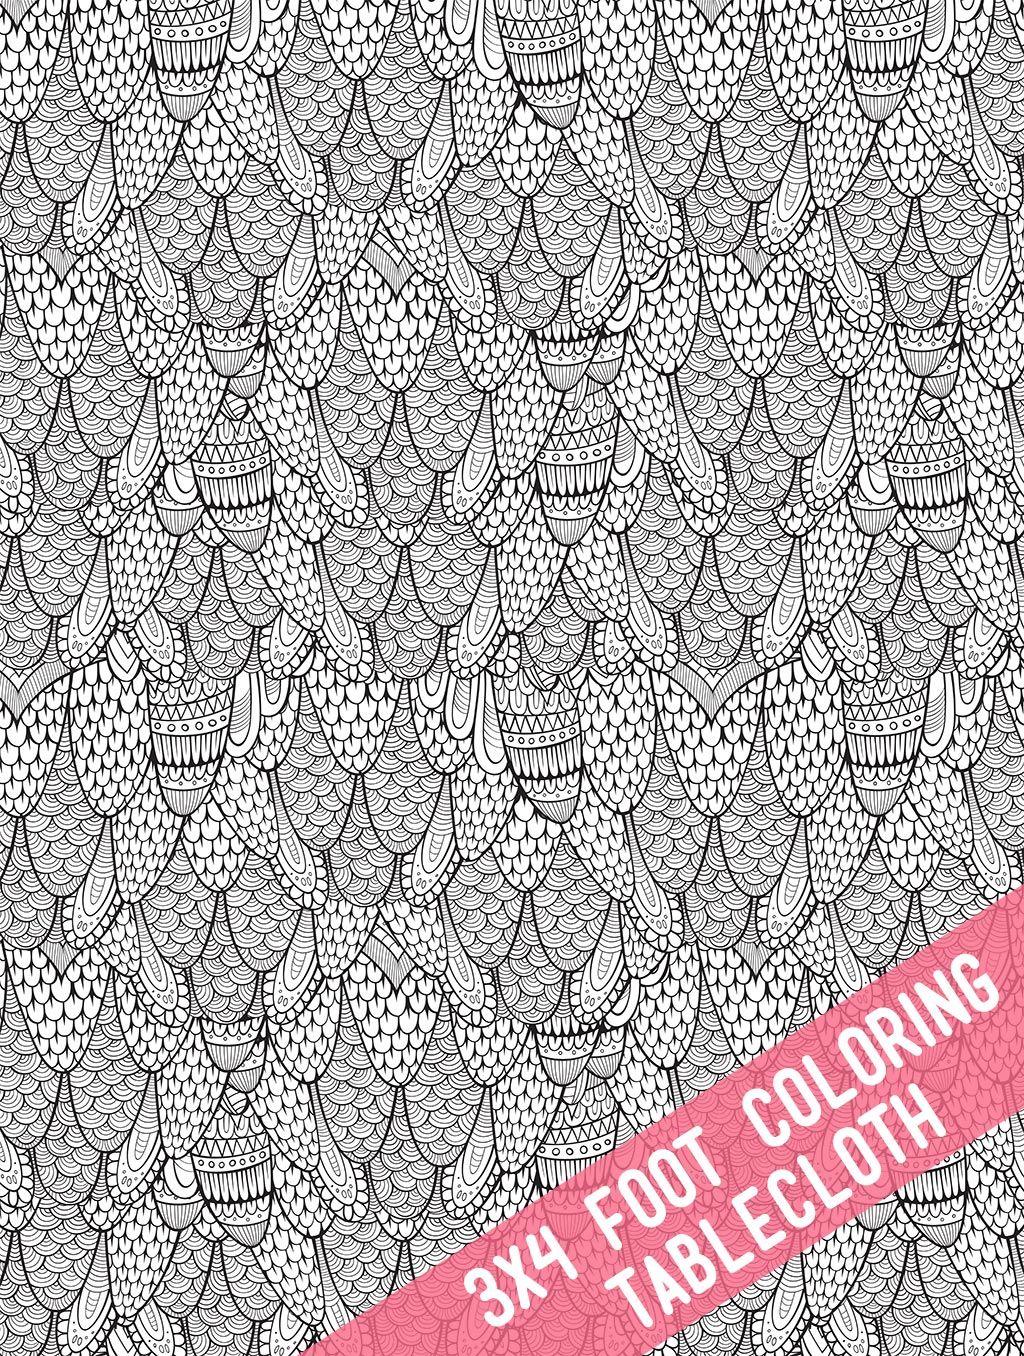 Theelegantartist Diy Coloring Book Fabric Tablecloth Diy Coloring Books Coloring Books Diy Tablecloth